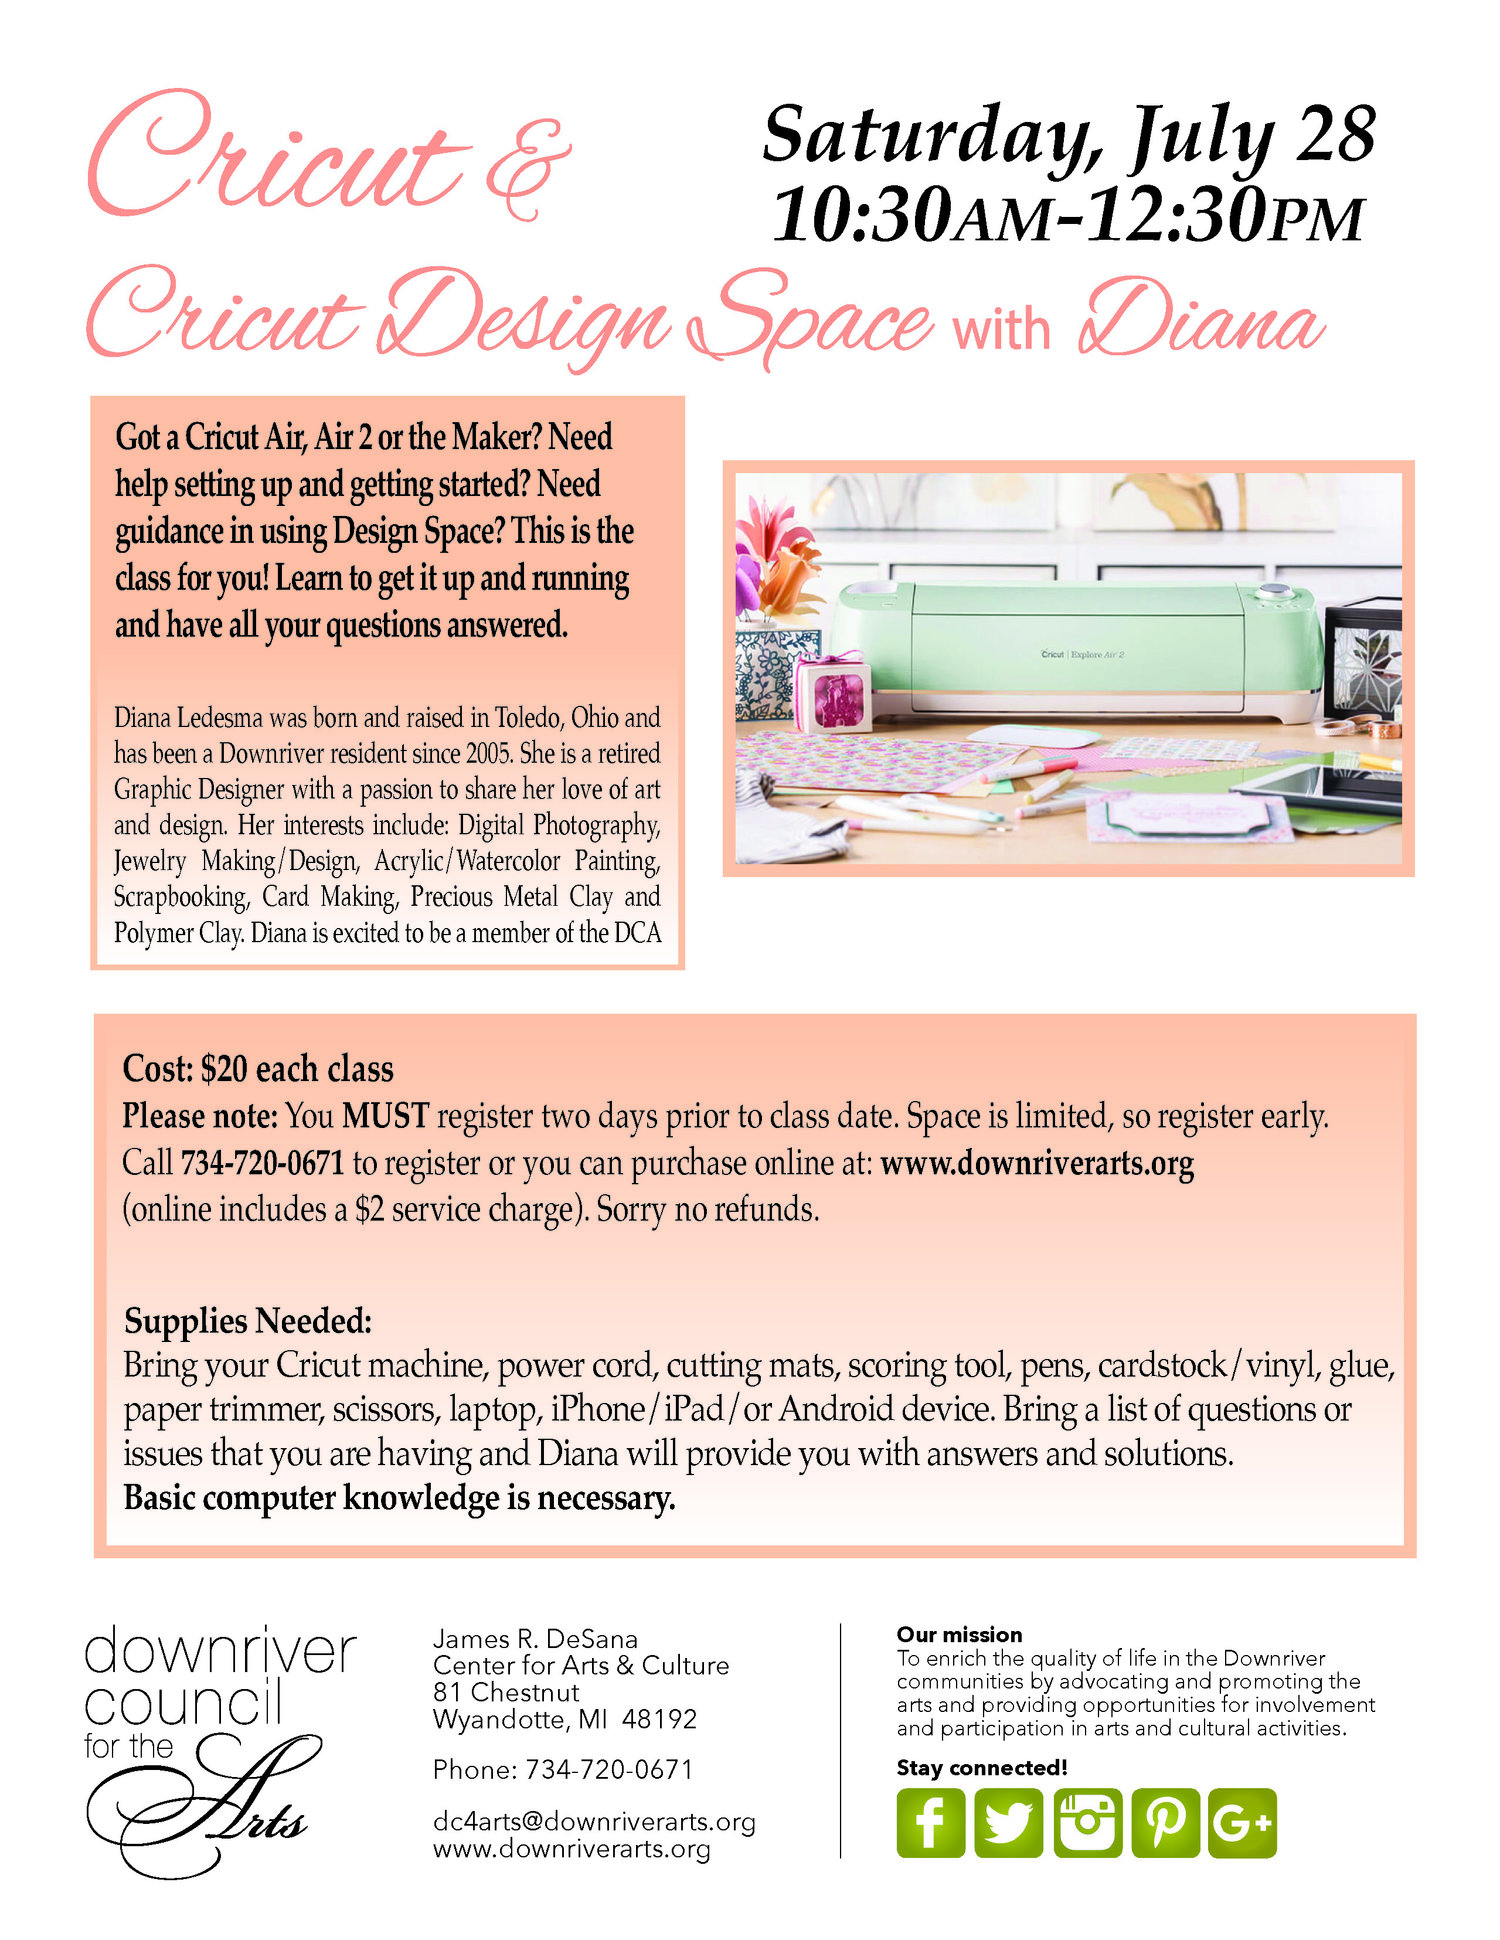 Cricut and Cricut Design Space with Diana - 7/28/18